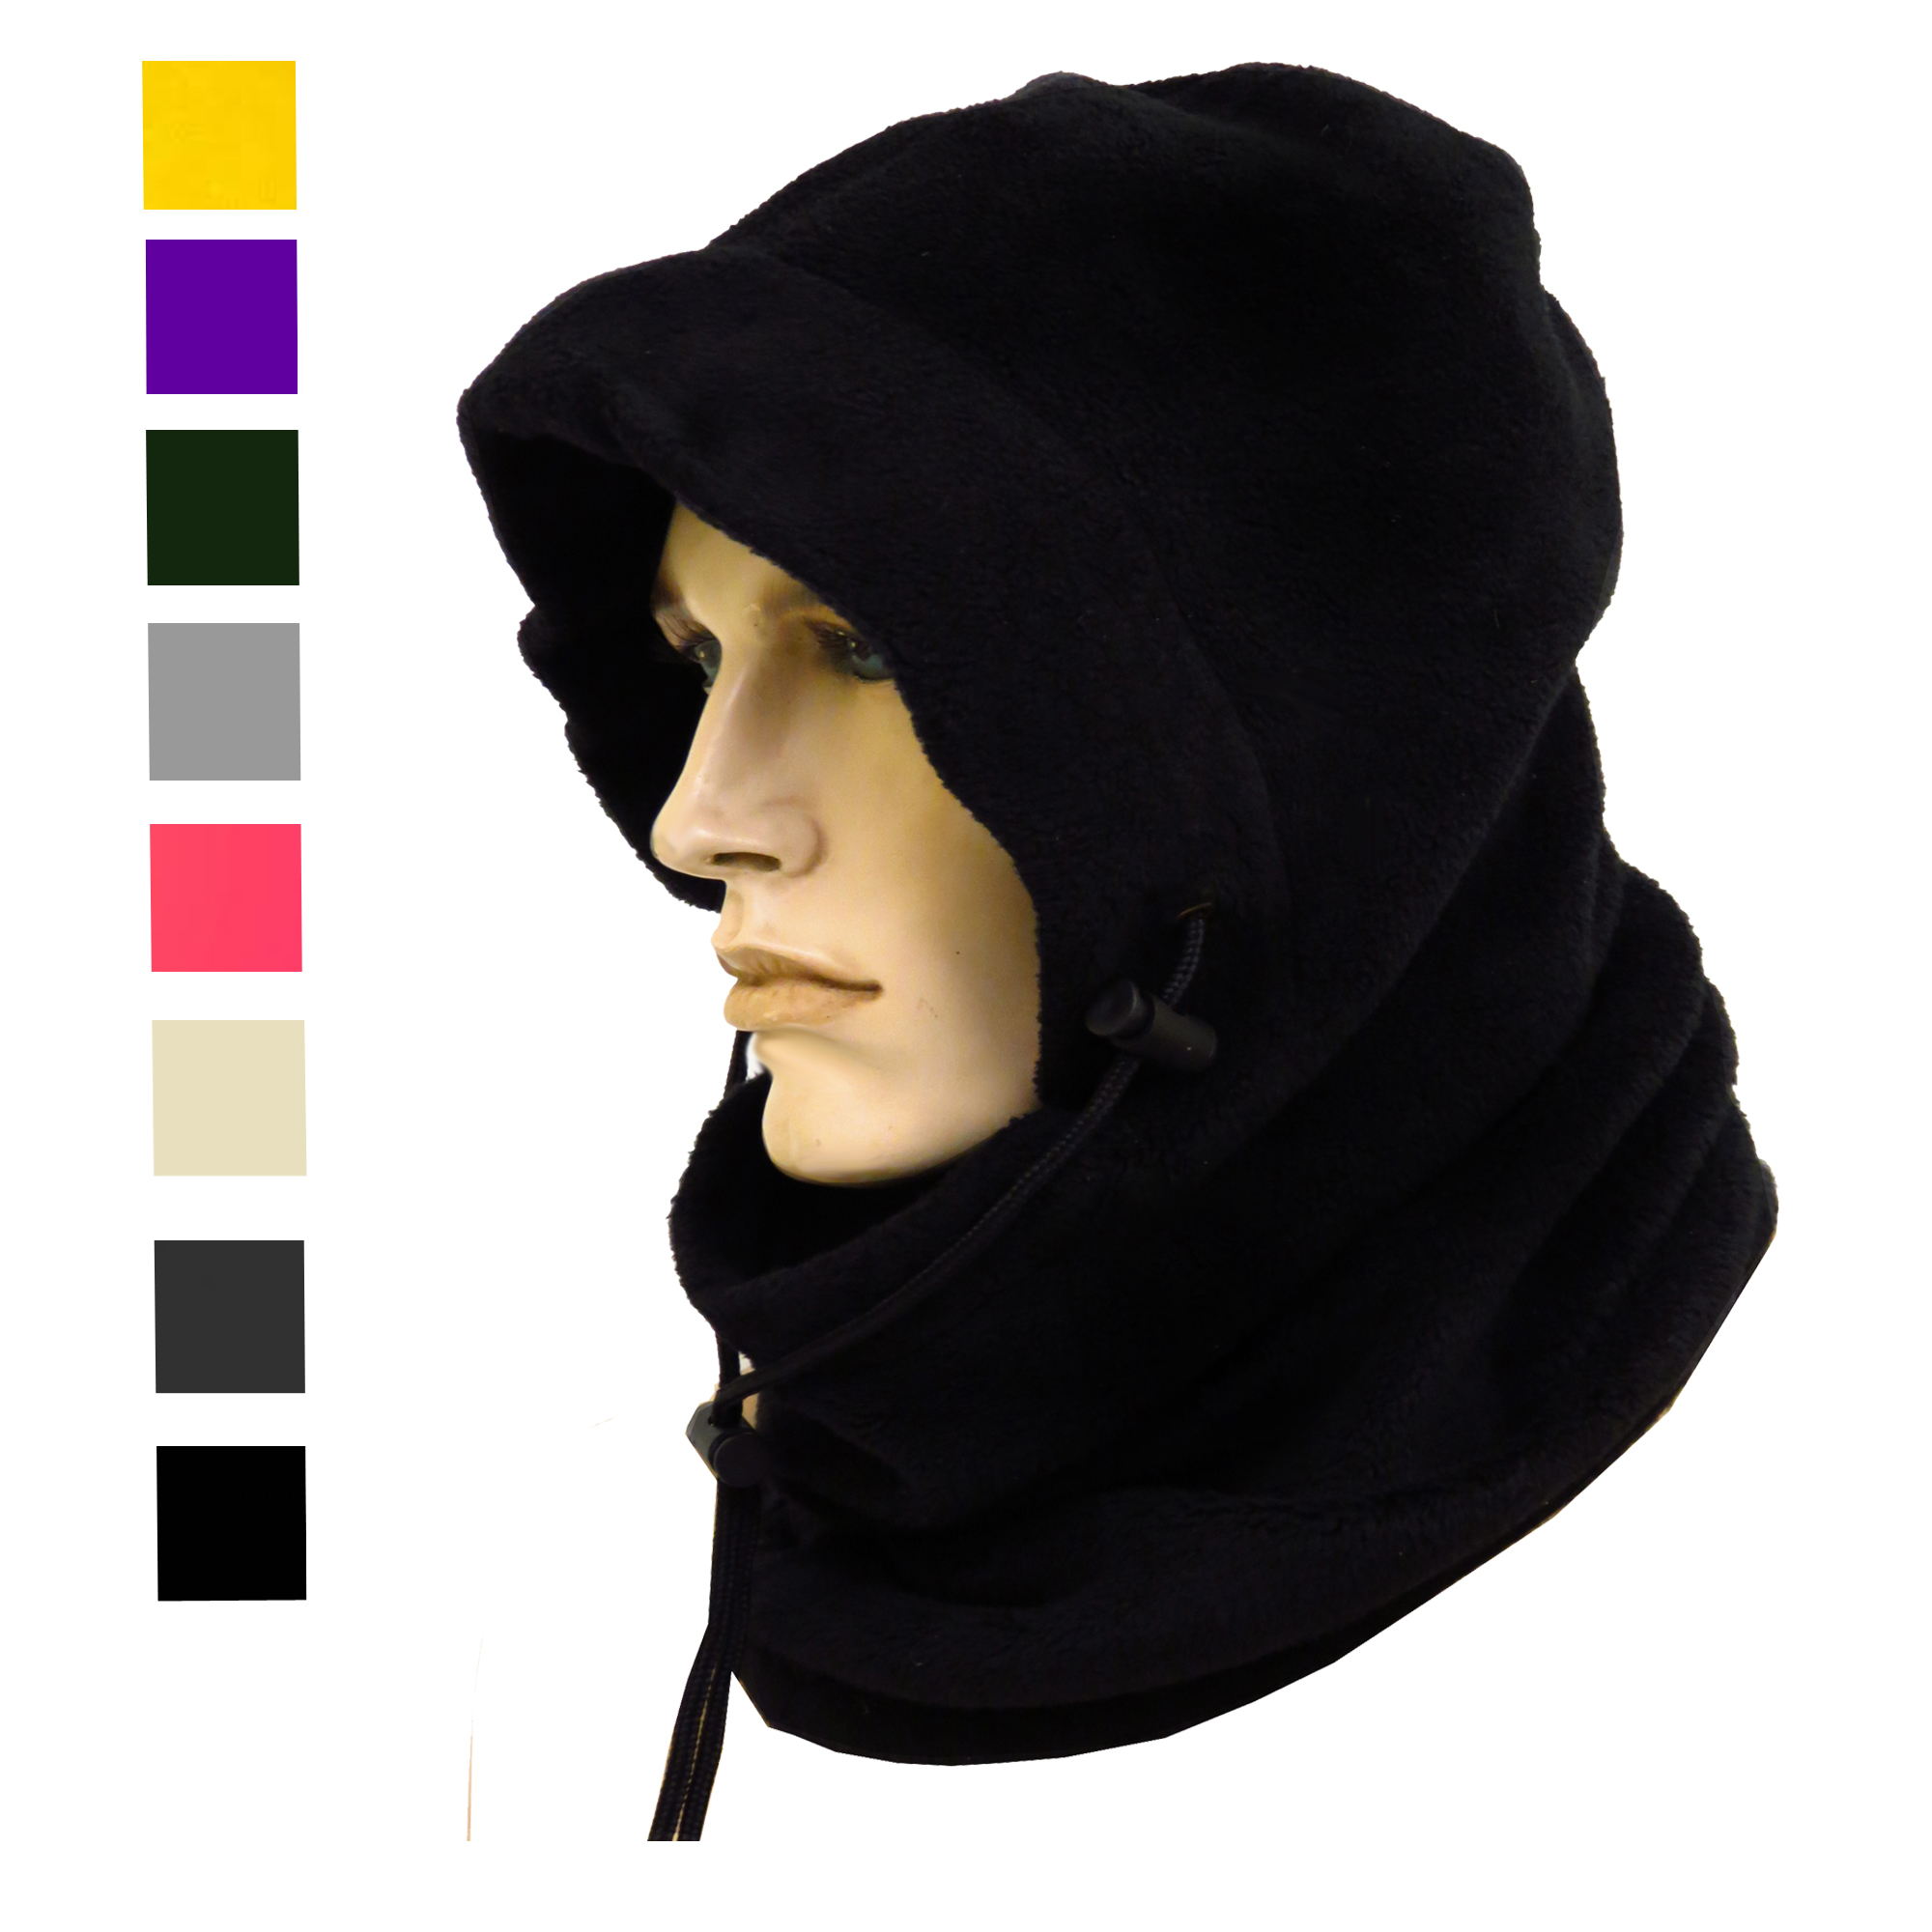 4 IN 1 THERMAL FLEECE SNOOD HOOD BALACLAVA NECK-WARMER WINTER HAT ... dc368d32d39